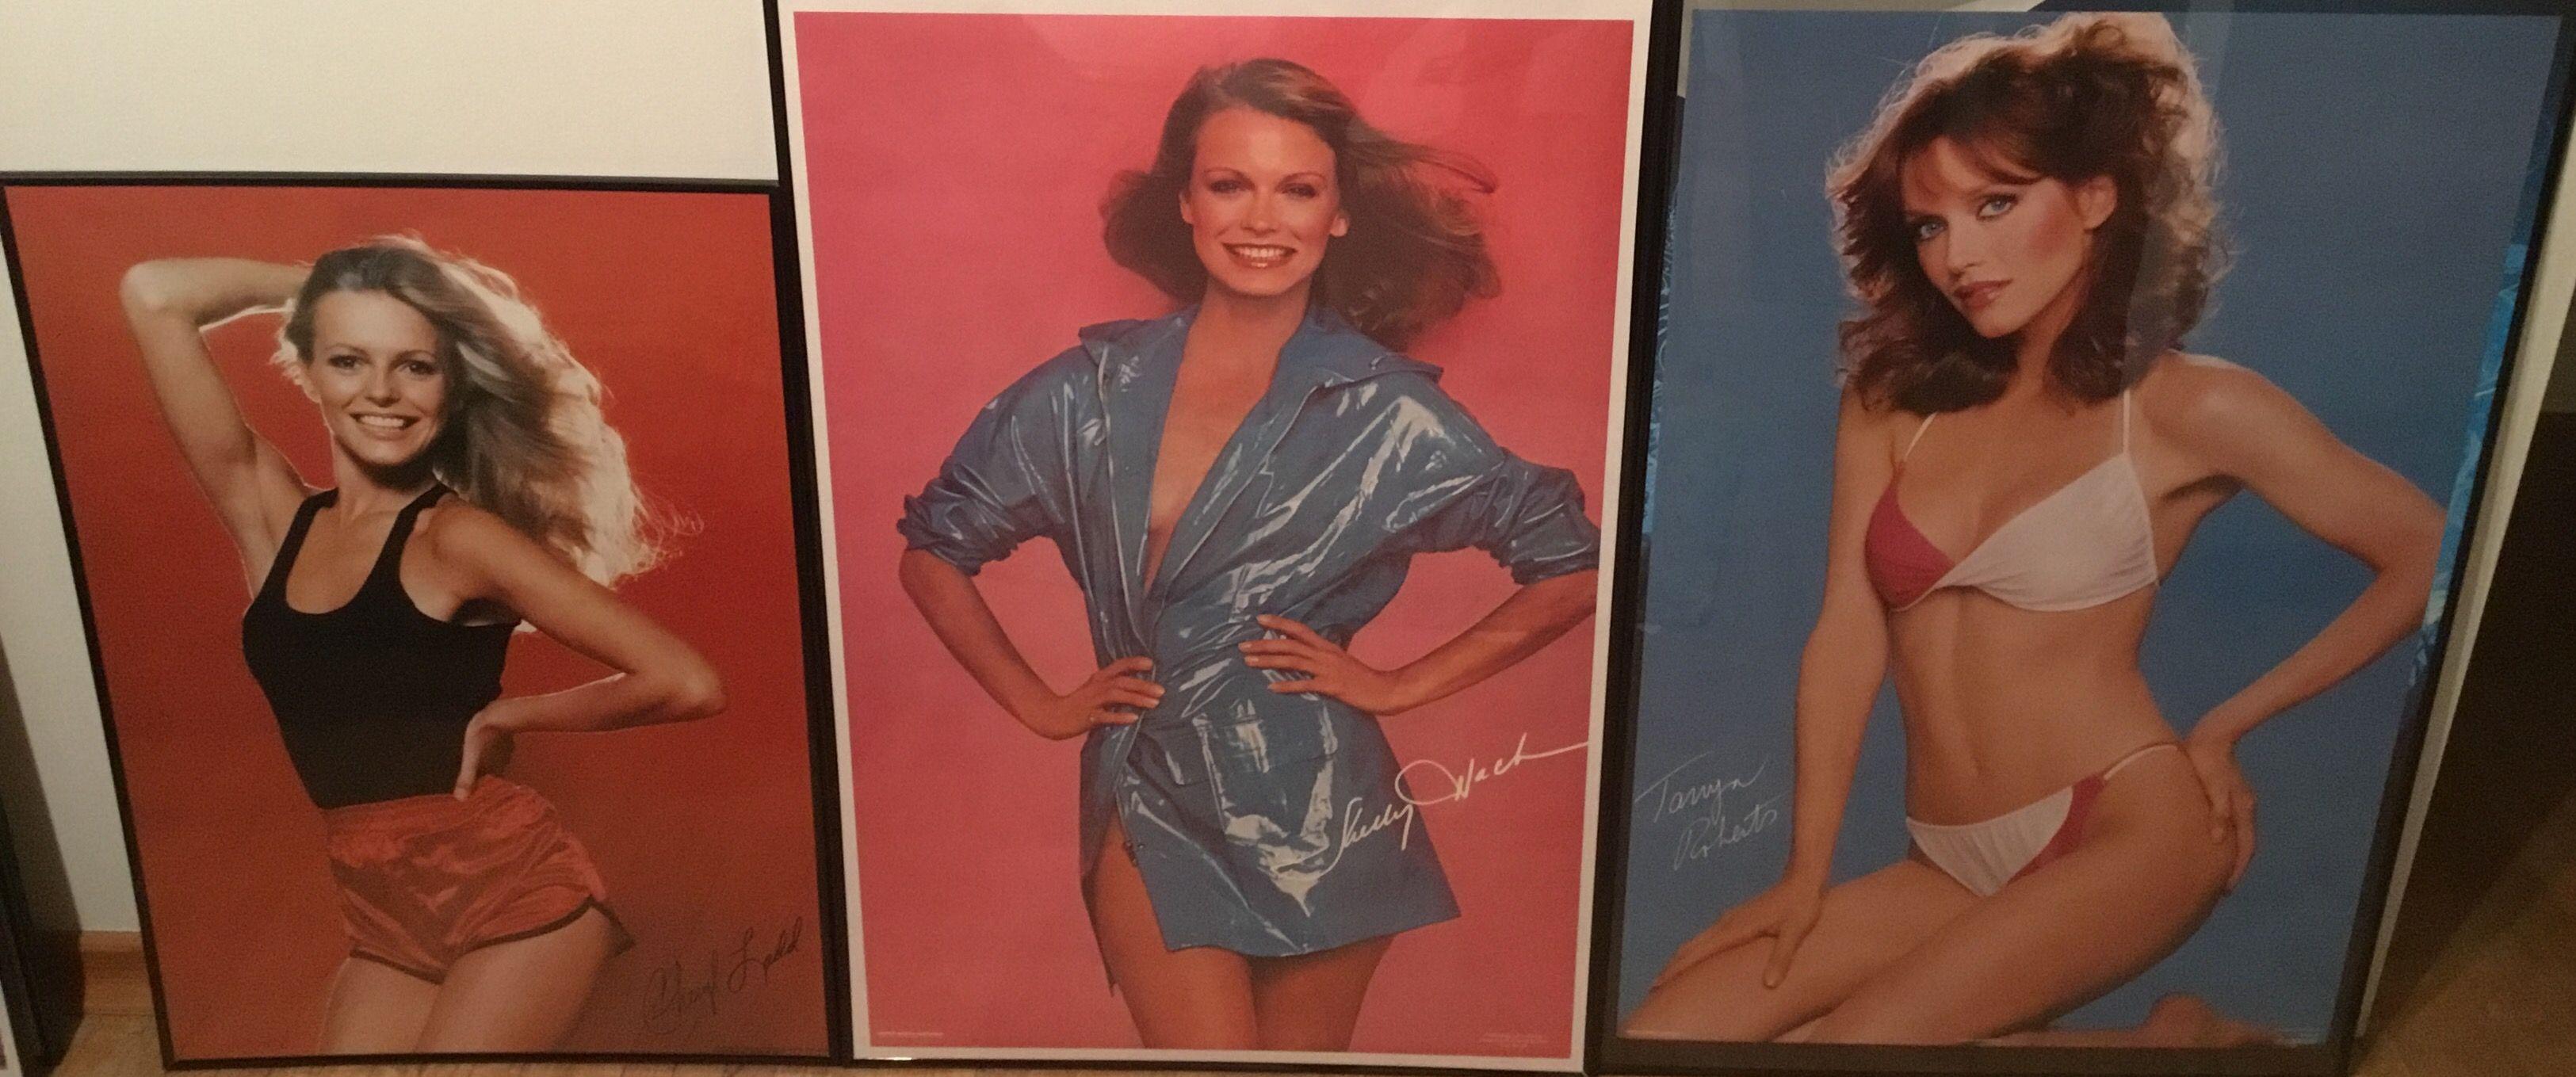 Charlie's Angels Cheryl Ladd Shelley Hack Tanya Roberts posters